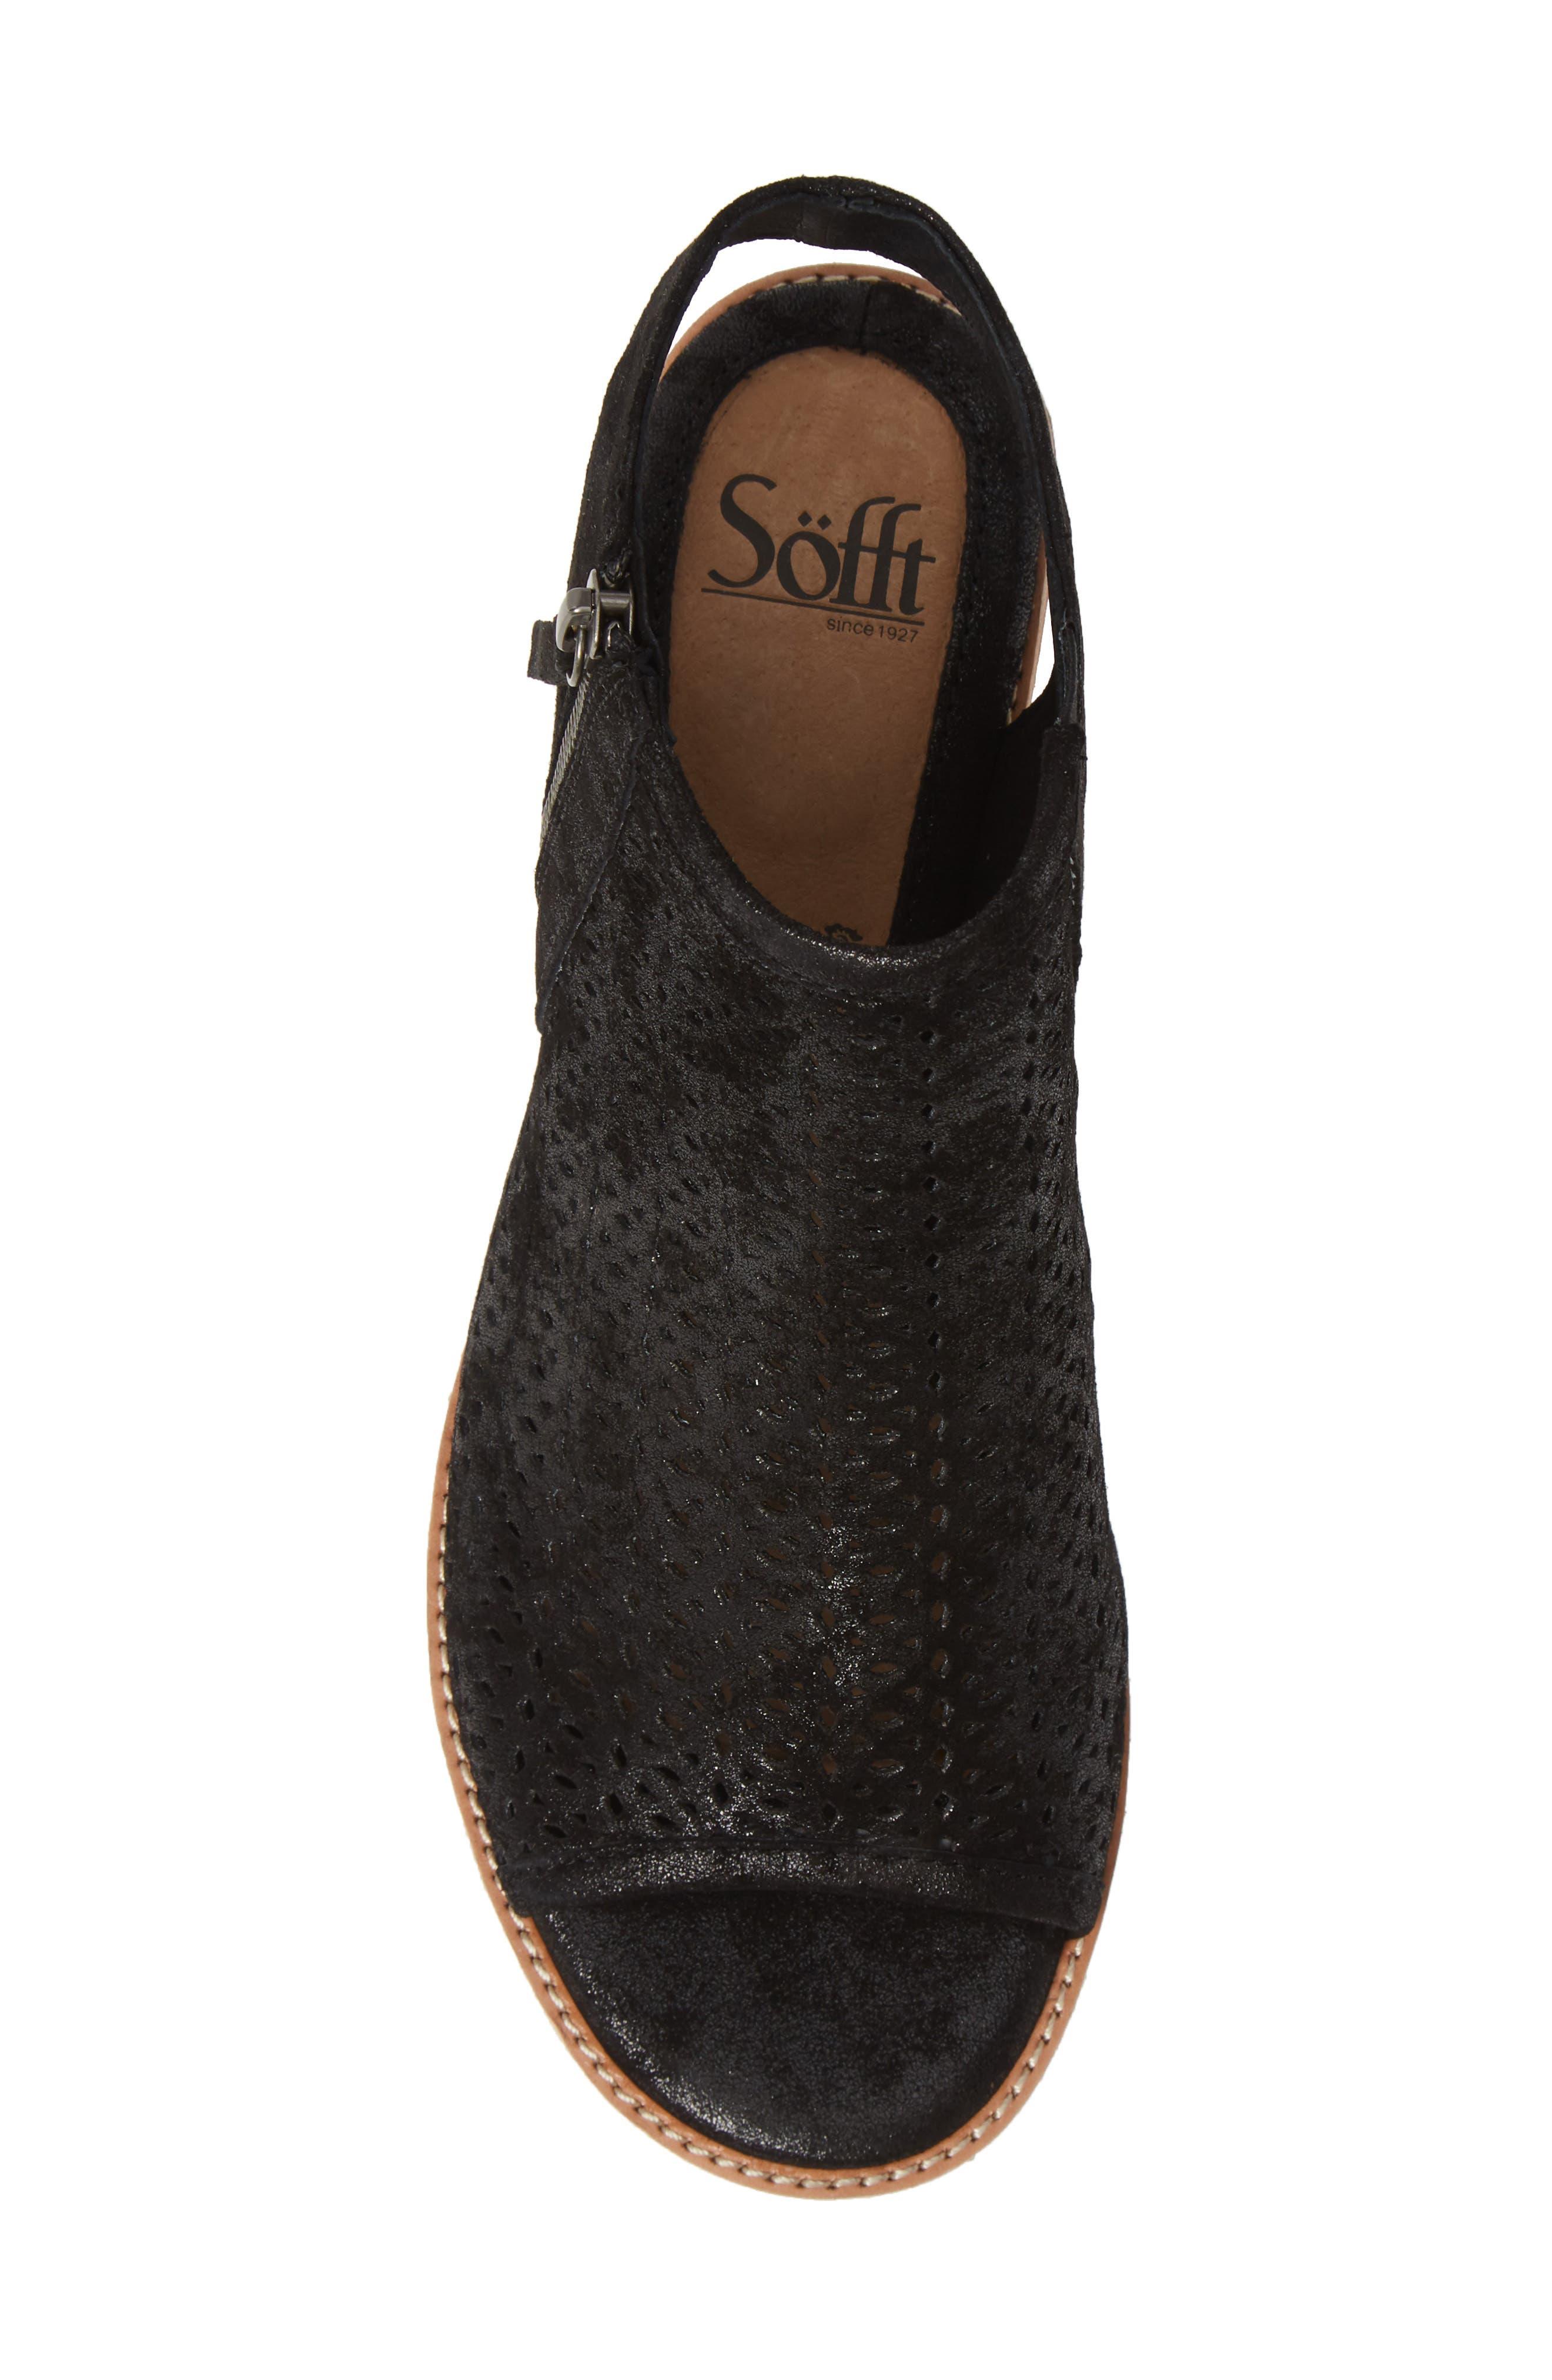 Natesa Perforated Sandal,                             Alternate thumbnail 5, color,                             BLACK SUEDE